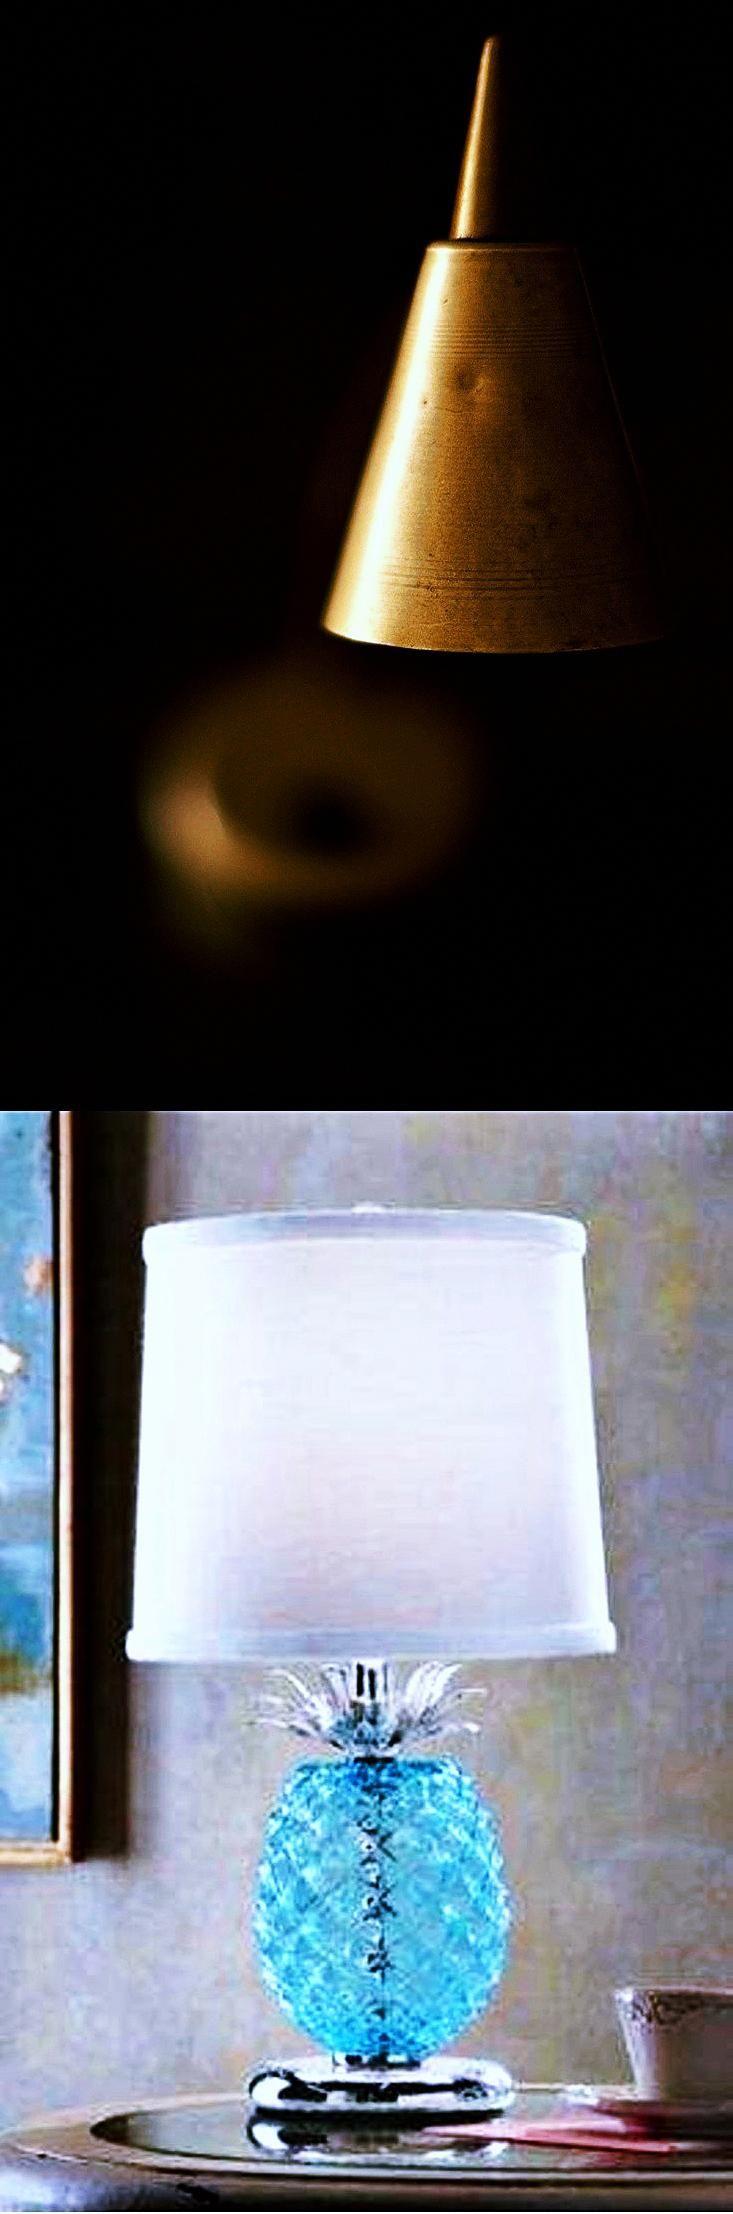 Tall Thin Lamp Table Going To Buy Lamptableonline Lampshadesfortablelamps Desklamp Dressingtablelamp Lamp Dressing Table Lamps Crystal Table Lamps